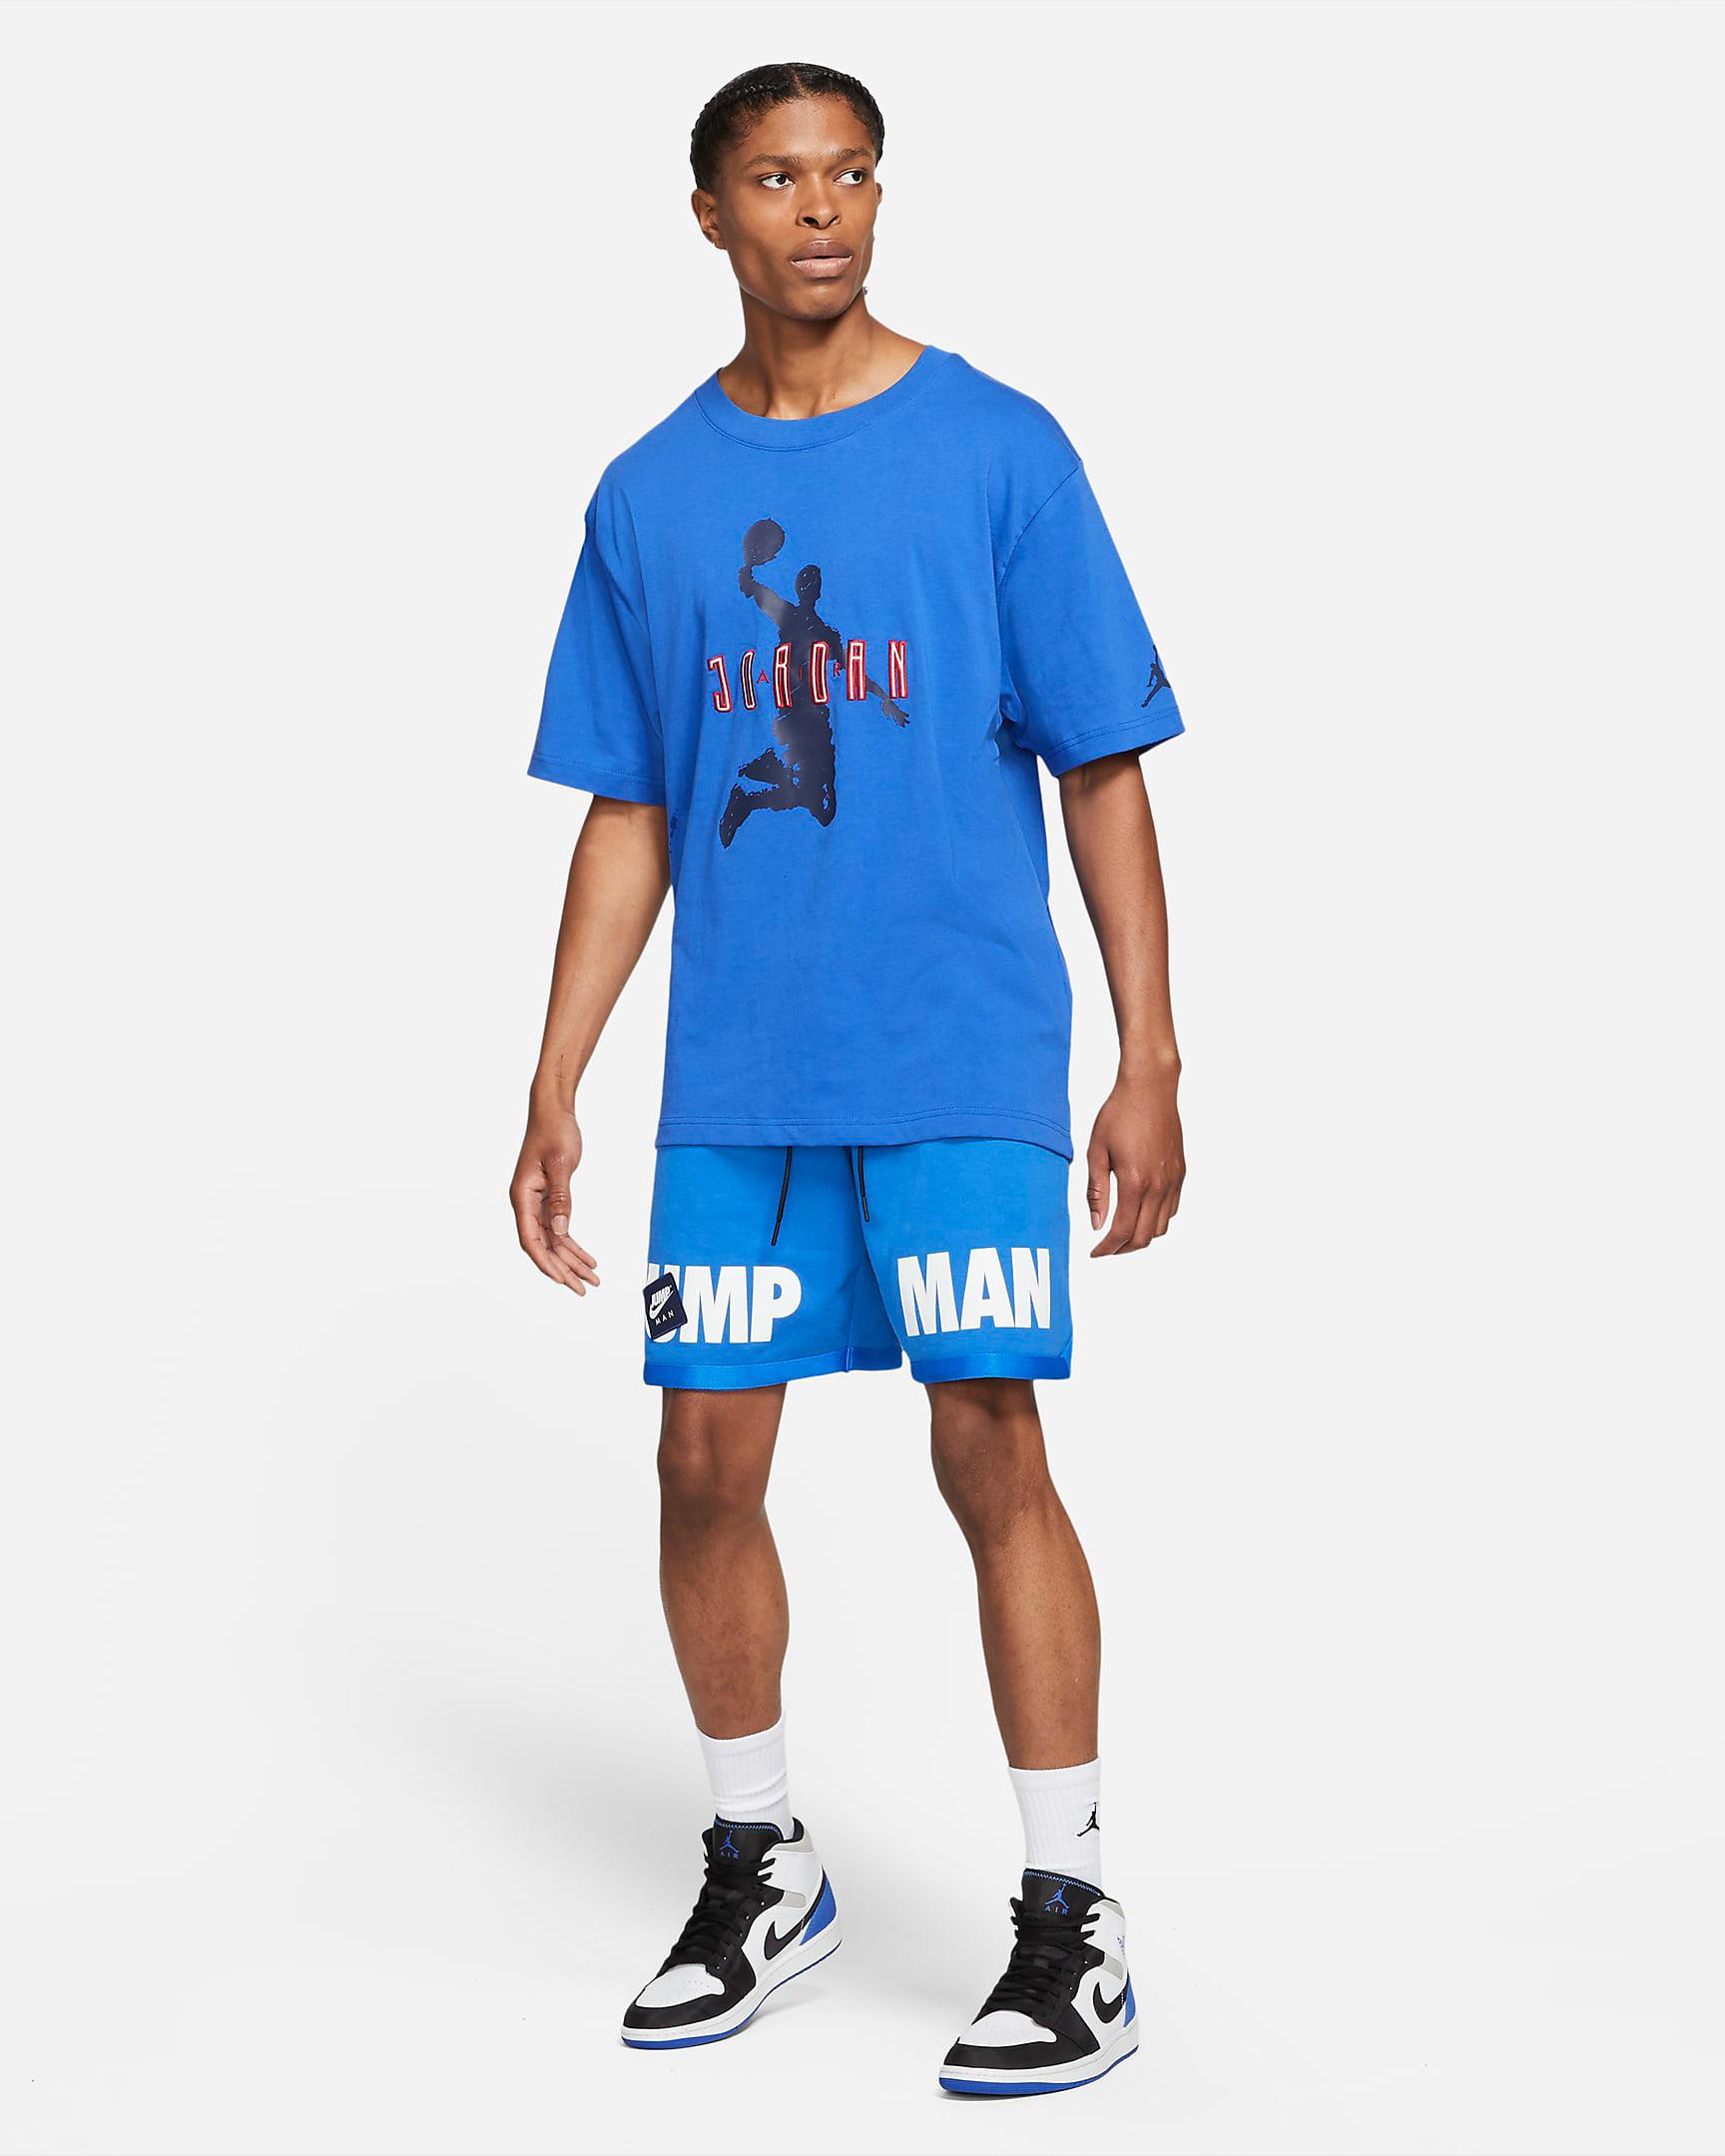 jordan-game-royal-sport-dna-shirt-shorts-outfit